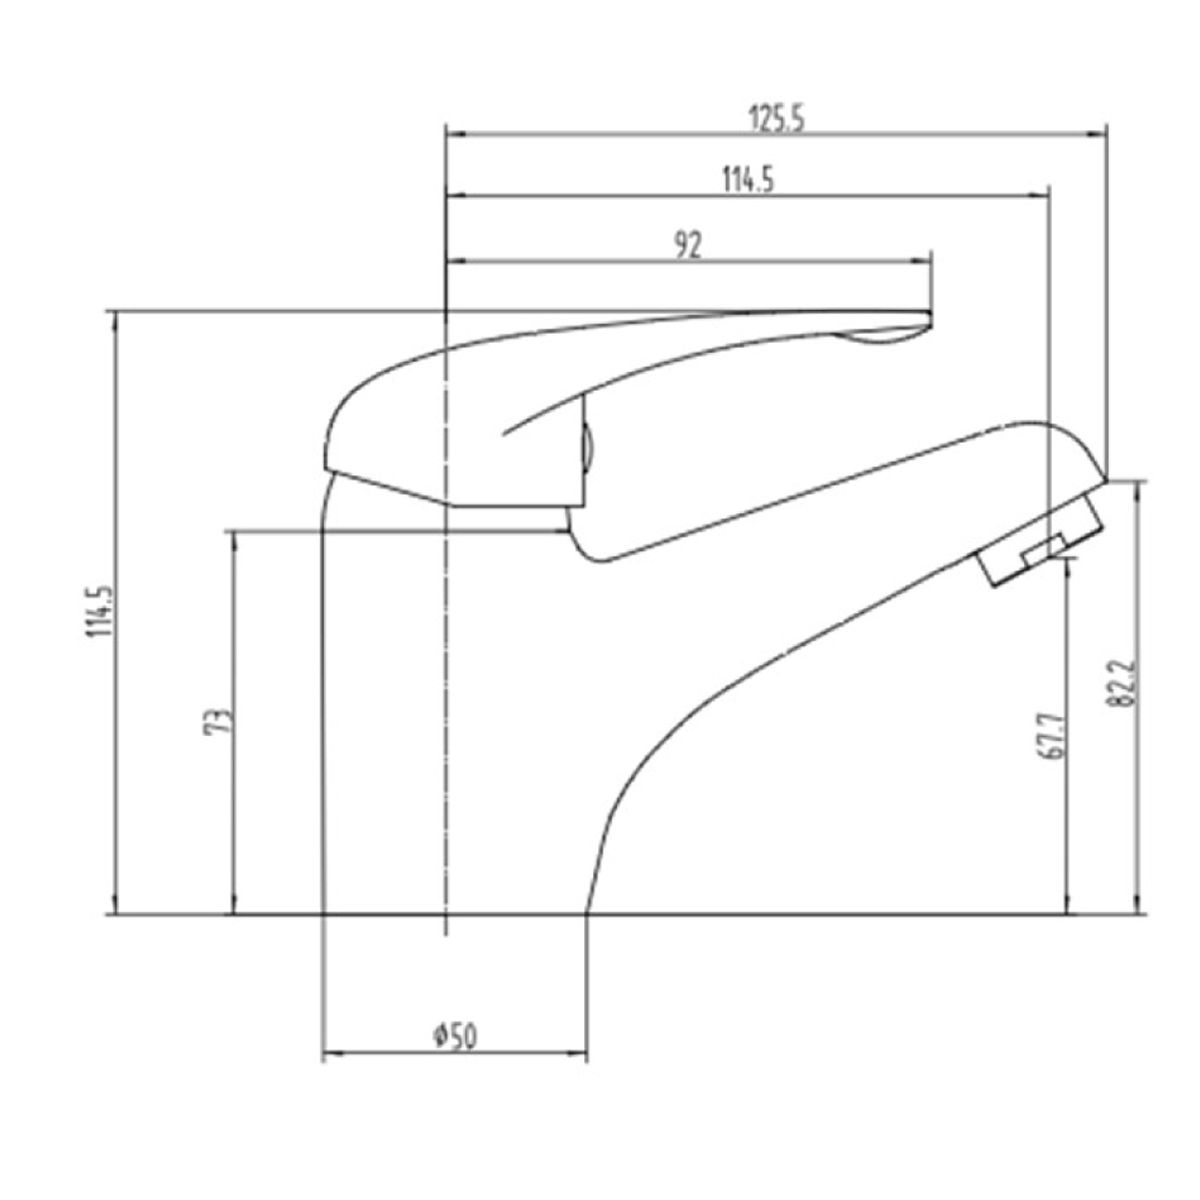 RAK Basic Mono Basin Mixer Tap with Waste Measurements